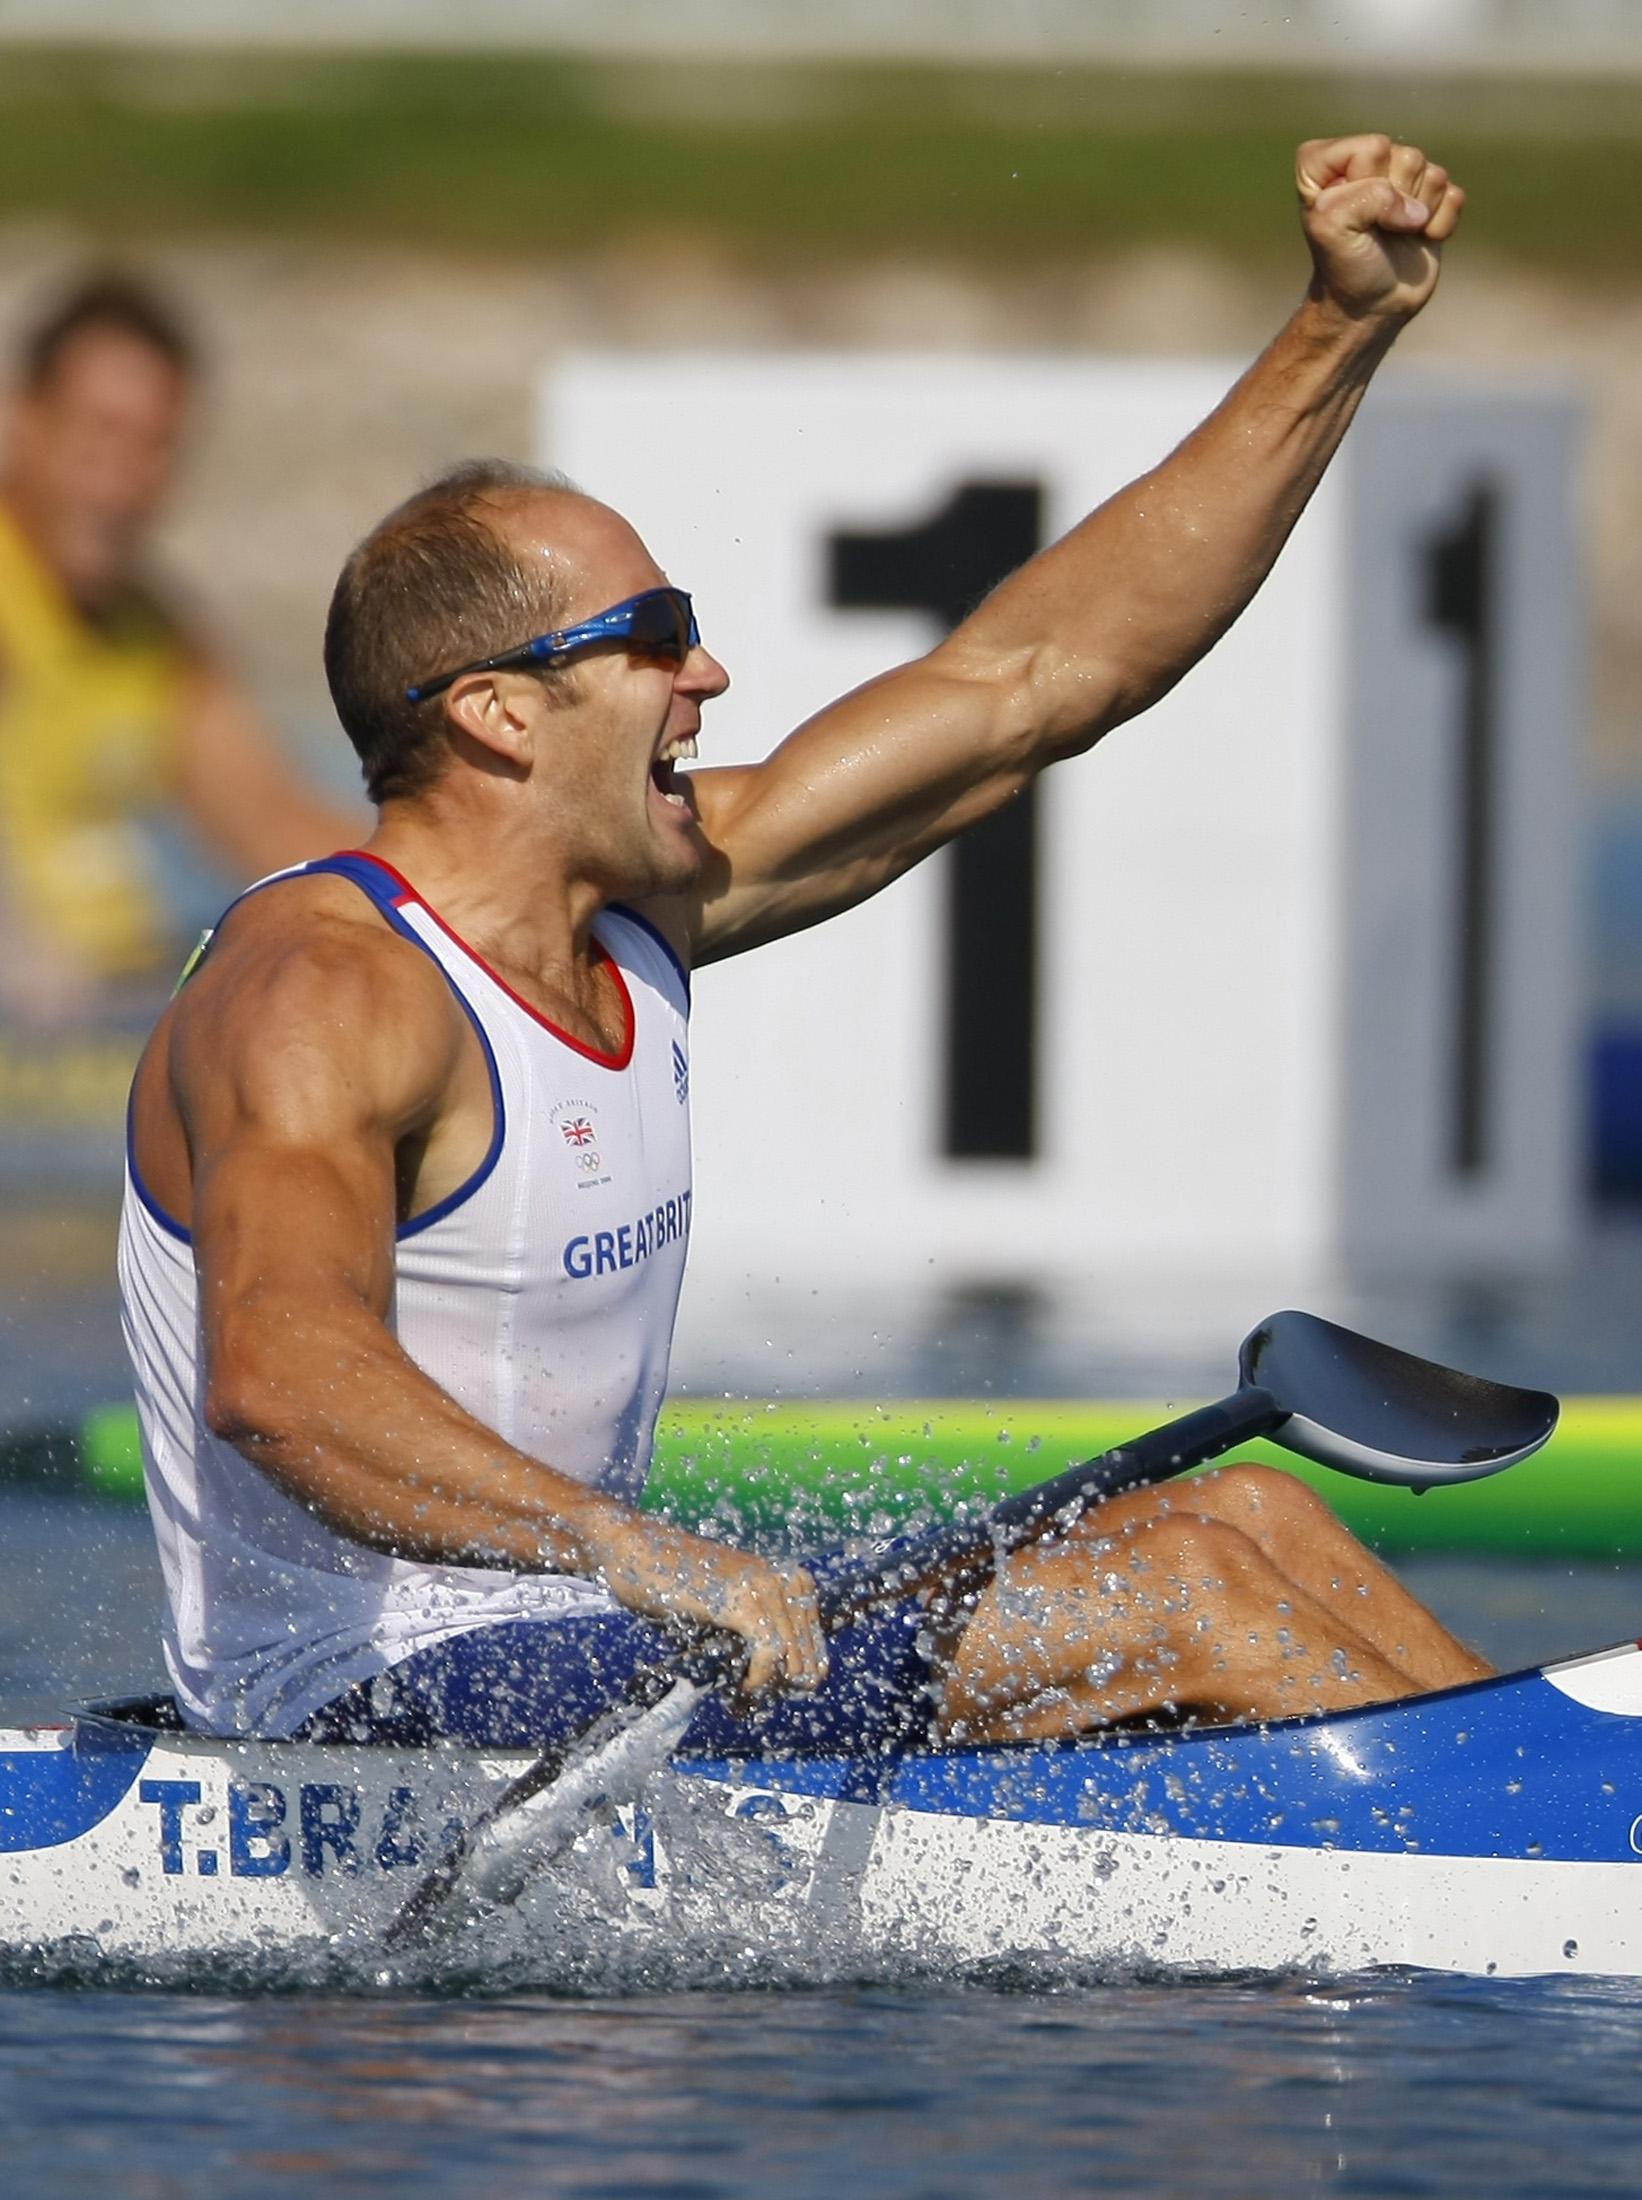 Tim Brabants of Britain celebrates winning his men's kayak single K1 1000m final of the Beijing 2008 Olympic Games at Shunyi Olympic Rowing-Canoeing P...